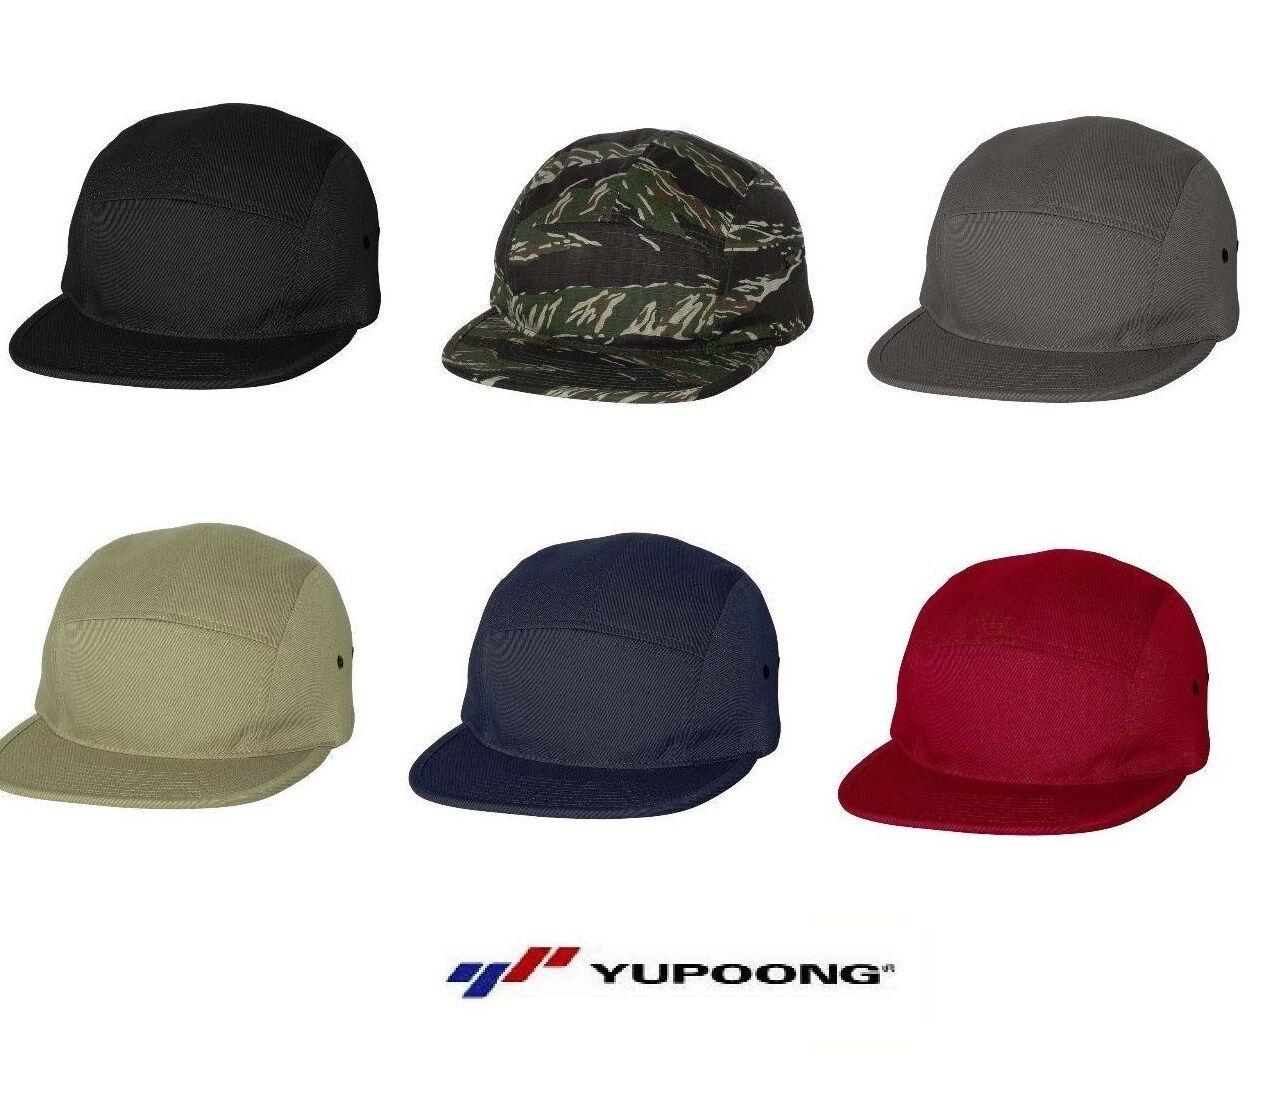 NEW Yupoong Jockey Flat Bill Cap 100% cotton 5 panel Jockey style Mens Hat  7005 7c6e47064ff